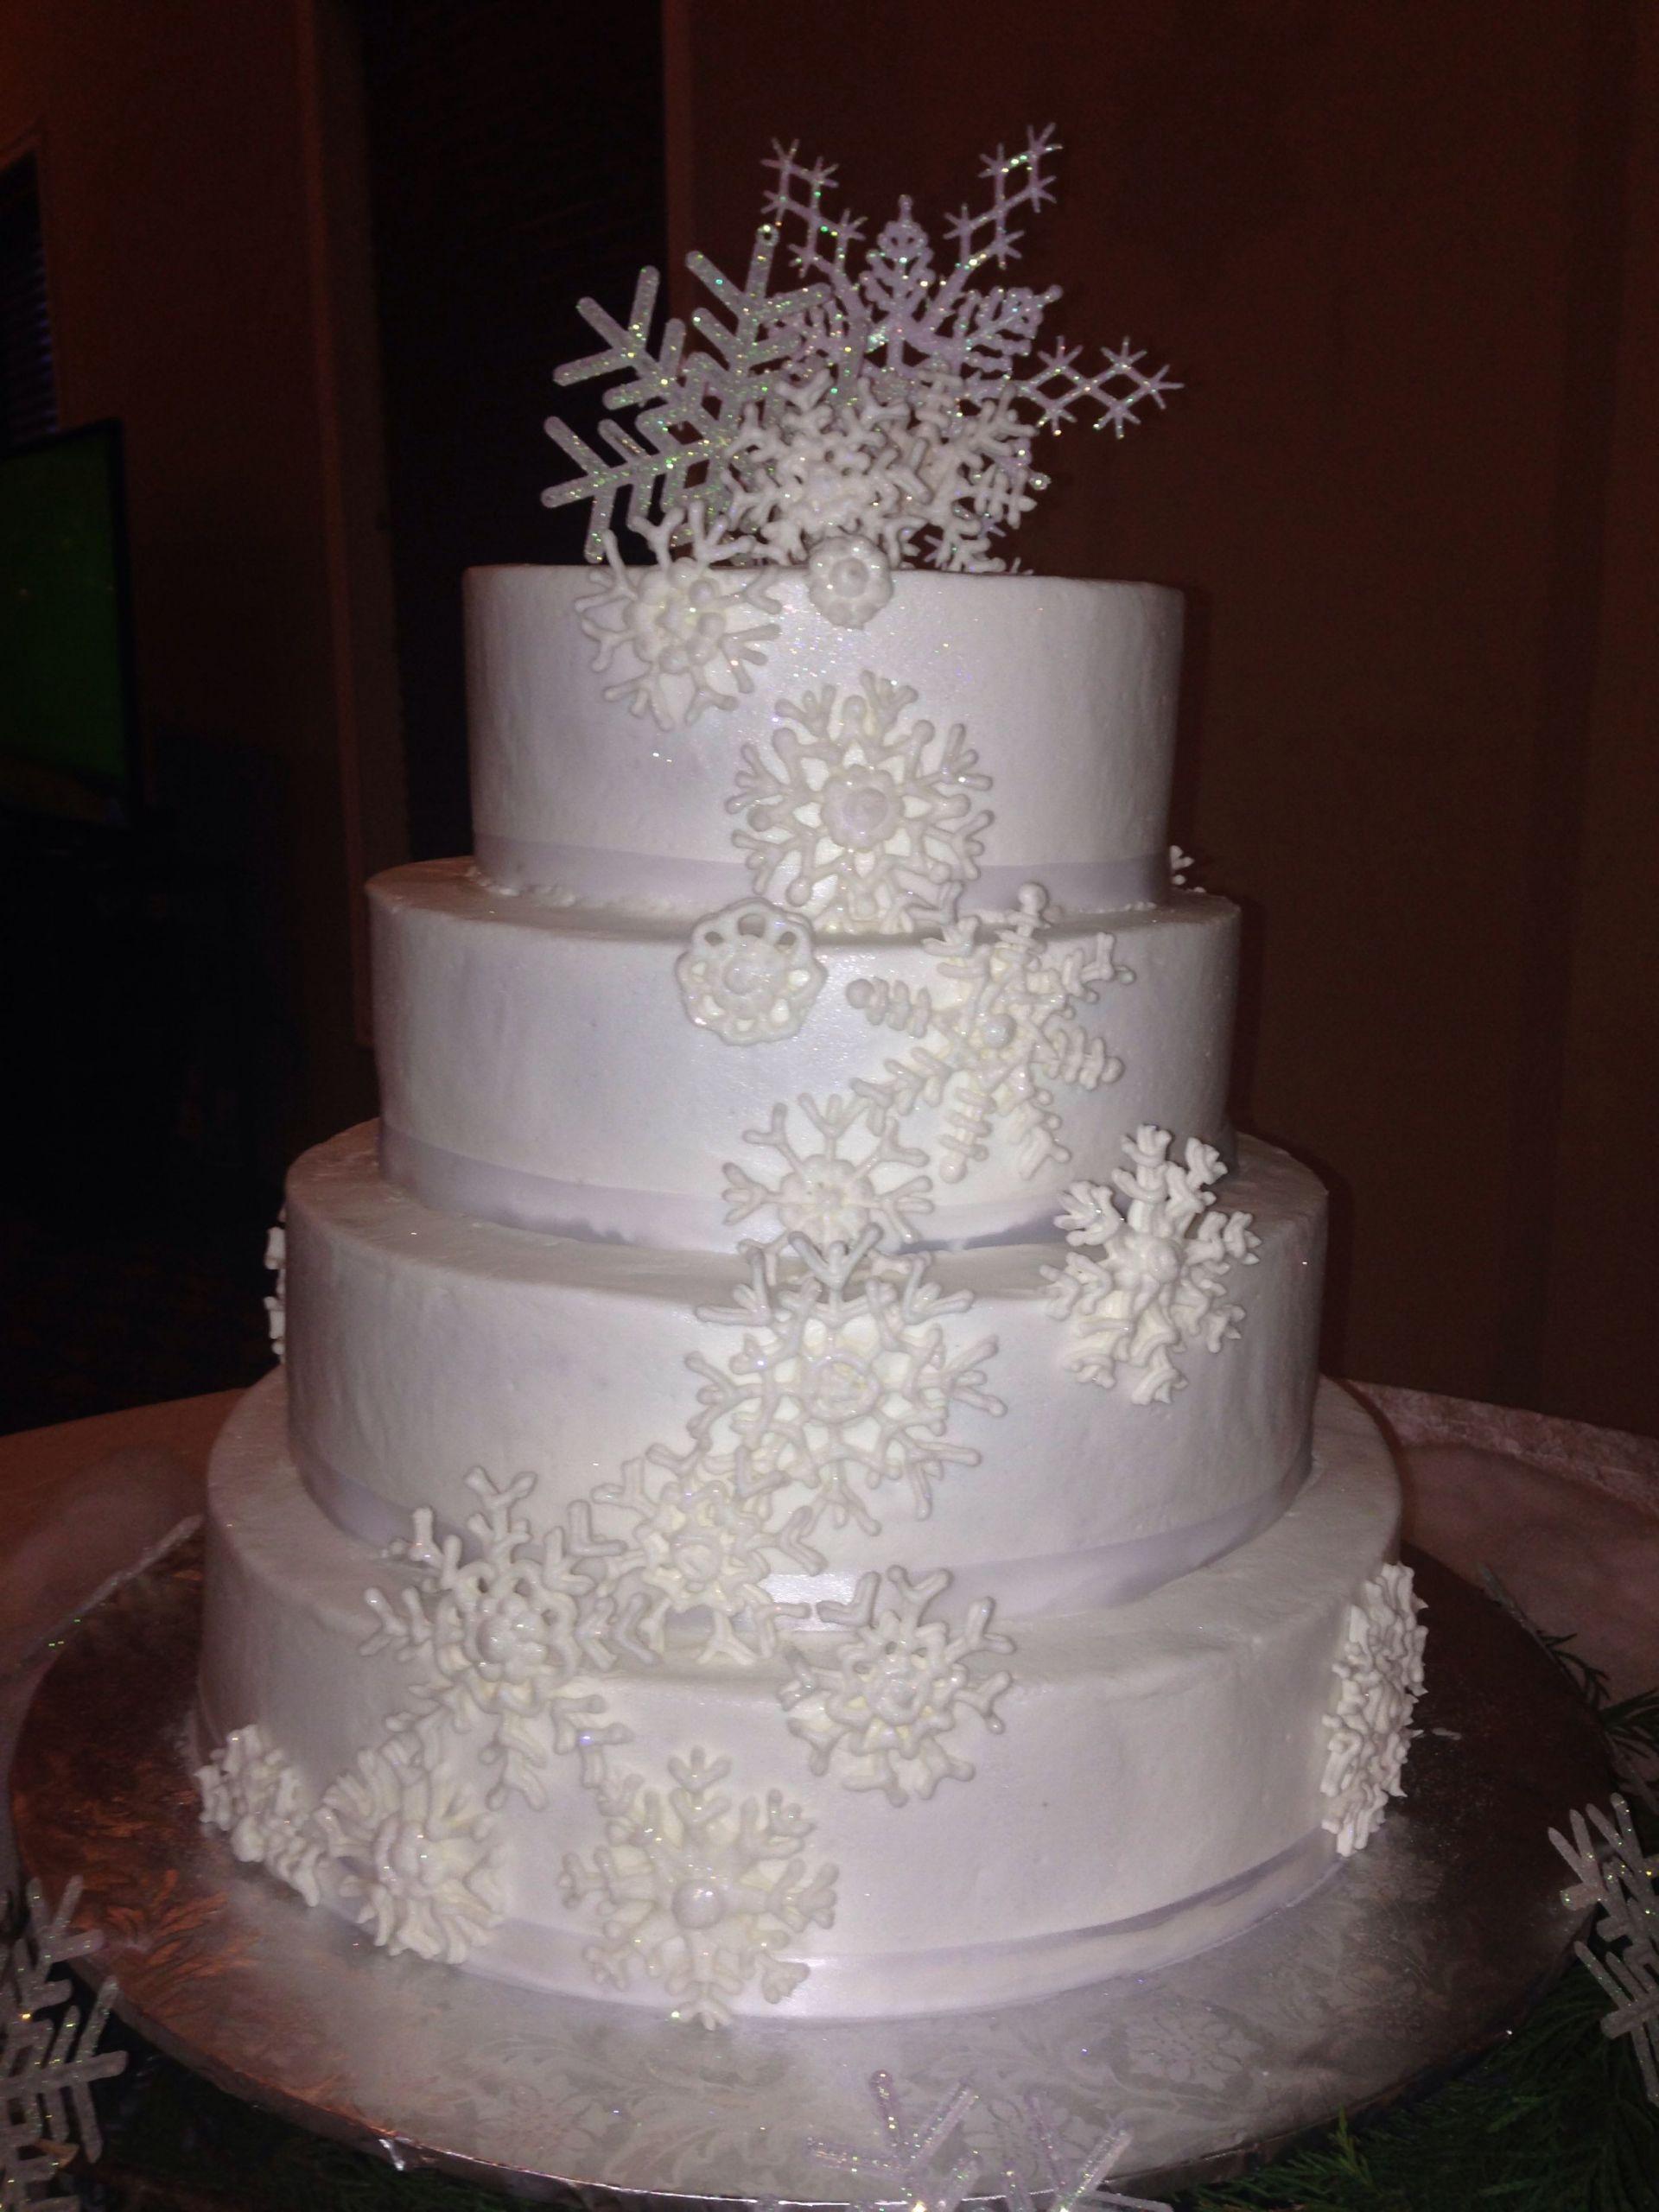 Winter Themed Wedding Cakes  Winter themed wedding cake i made Mallory Gray 50 Cakes